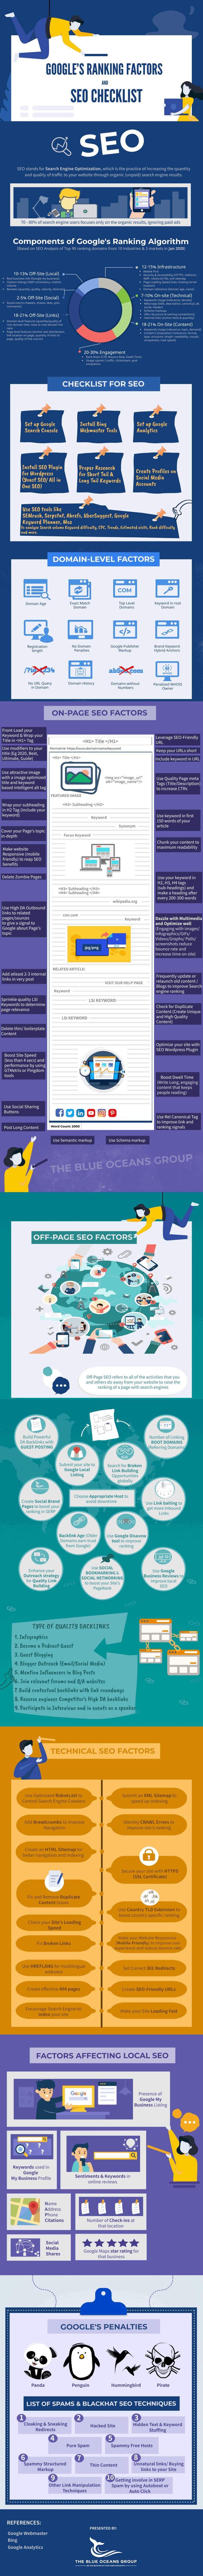 Infographic on  103 SEO Checklist & Google Ranking Factors